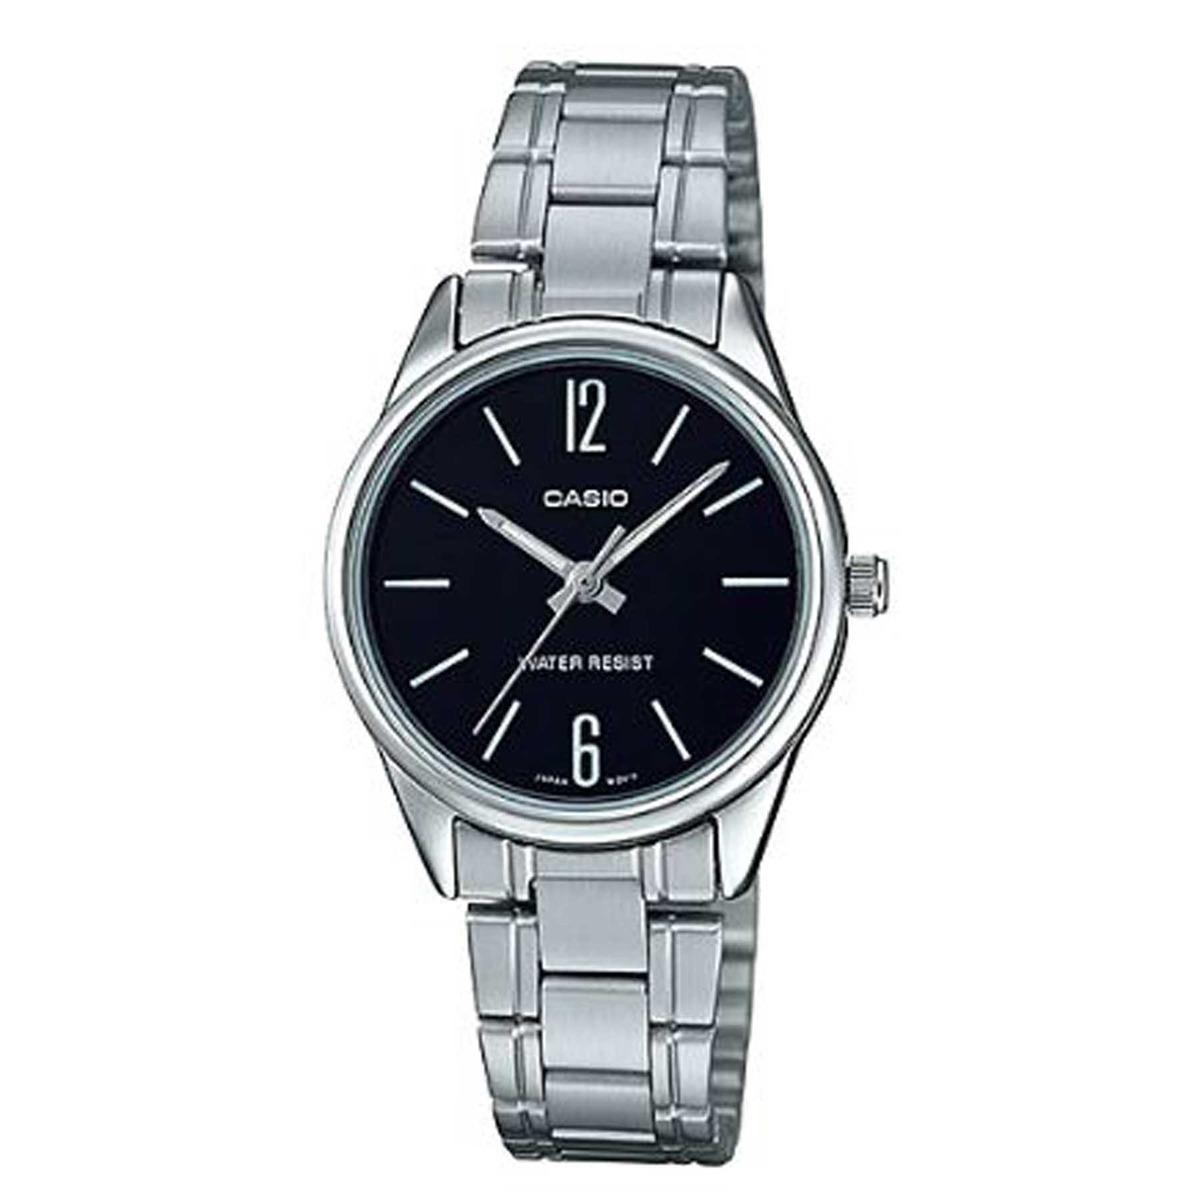 374df002915 Relógio Casio Feminino Analógico Aço Inox Ltp-v005d-1budf - R  179 ...